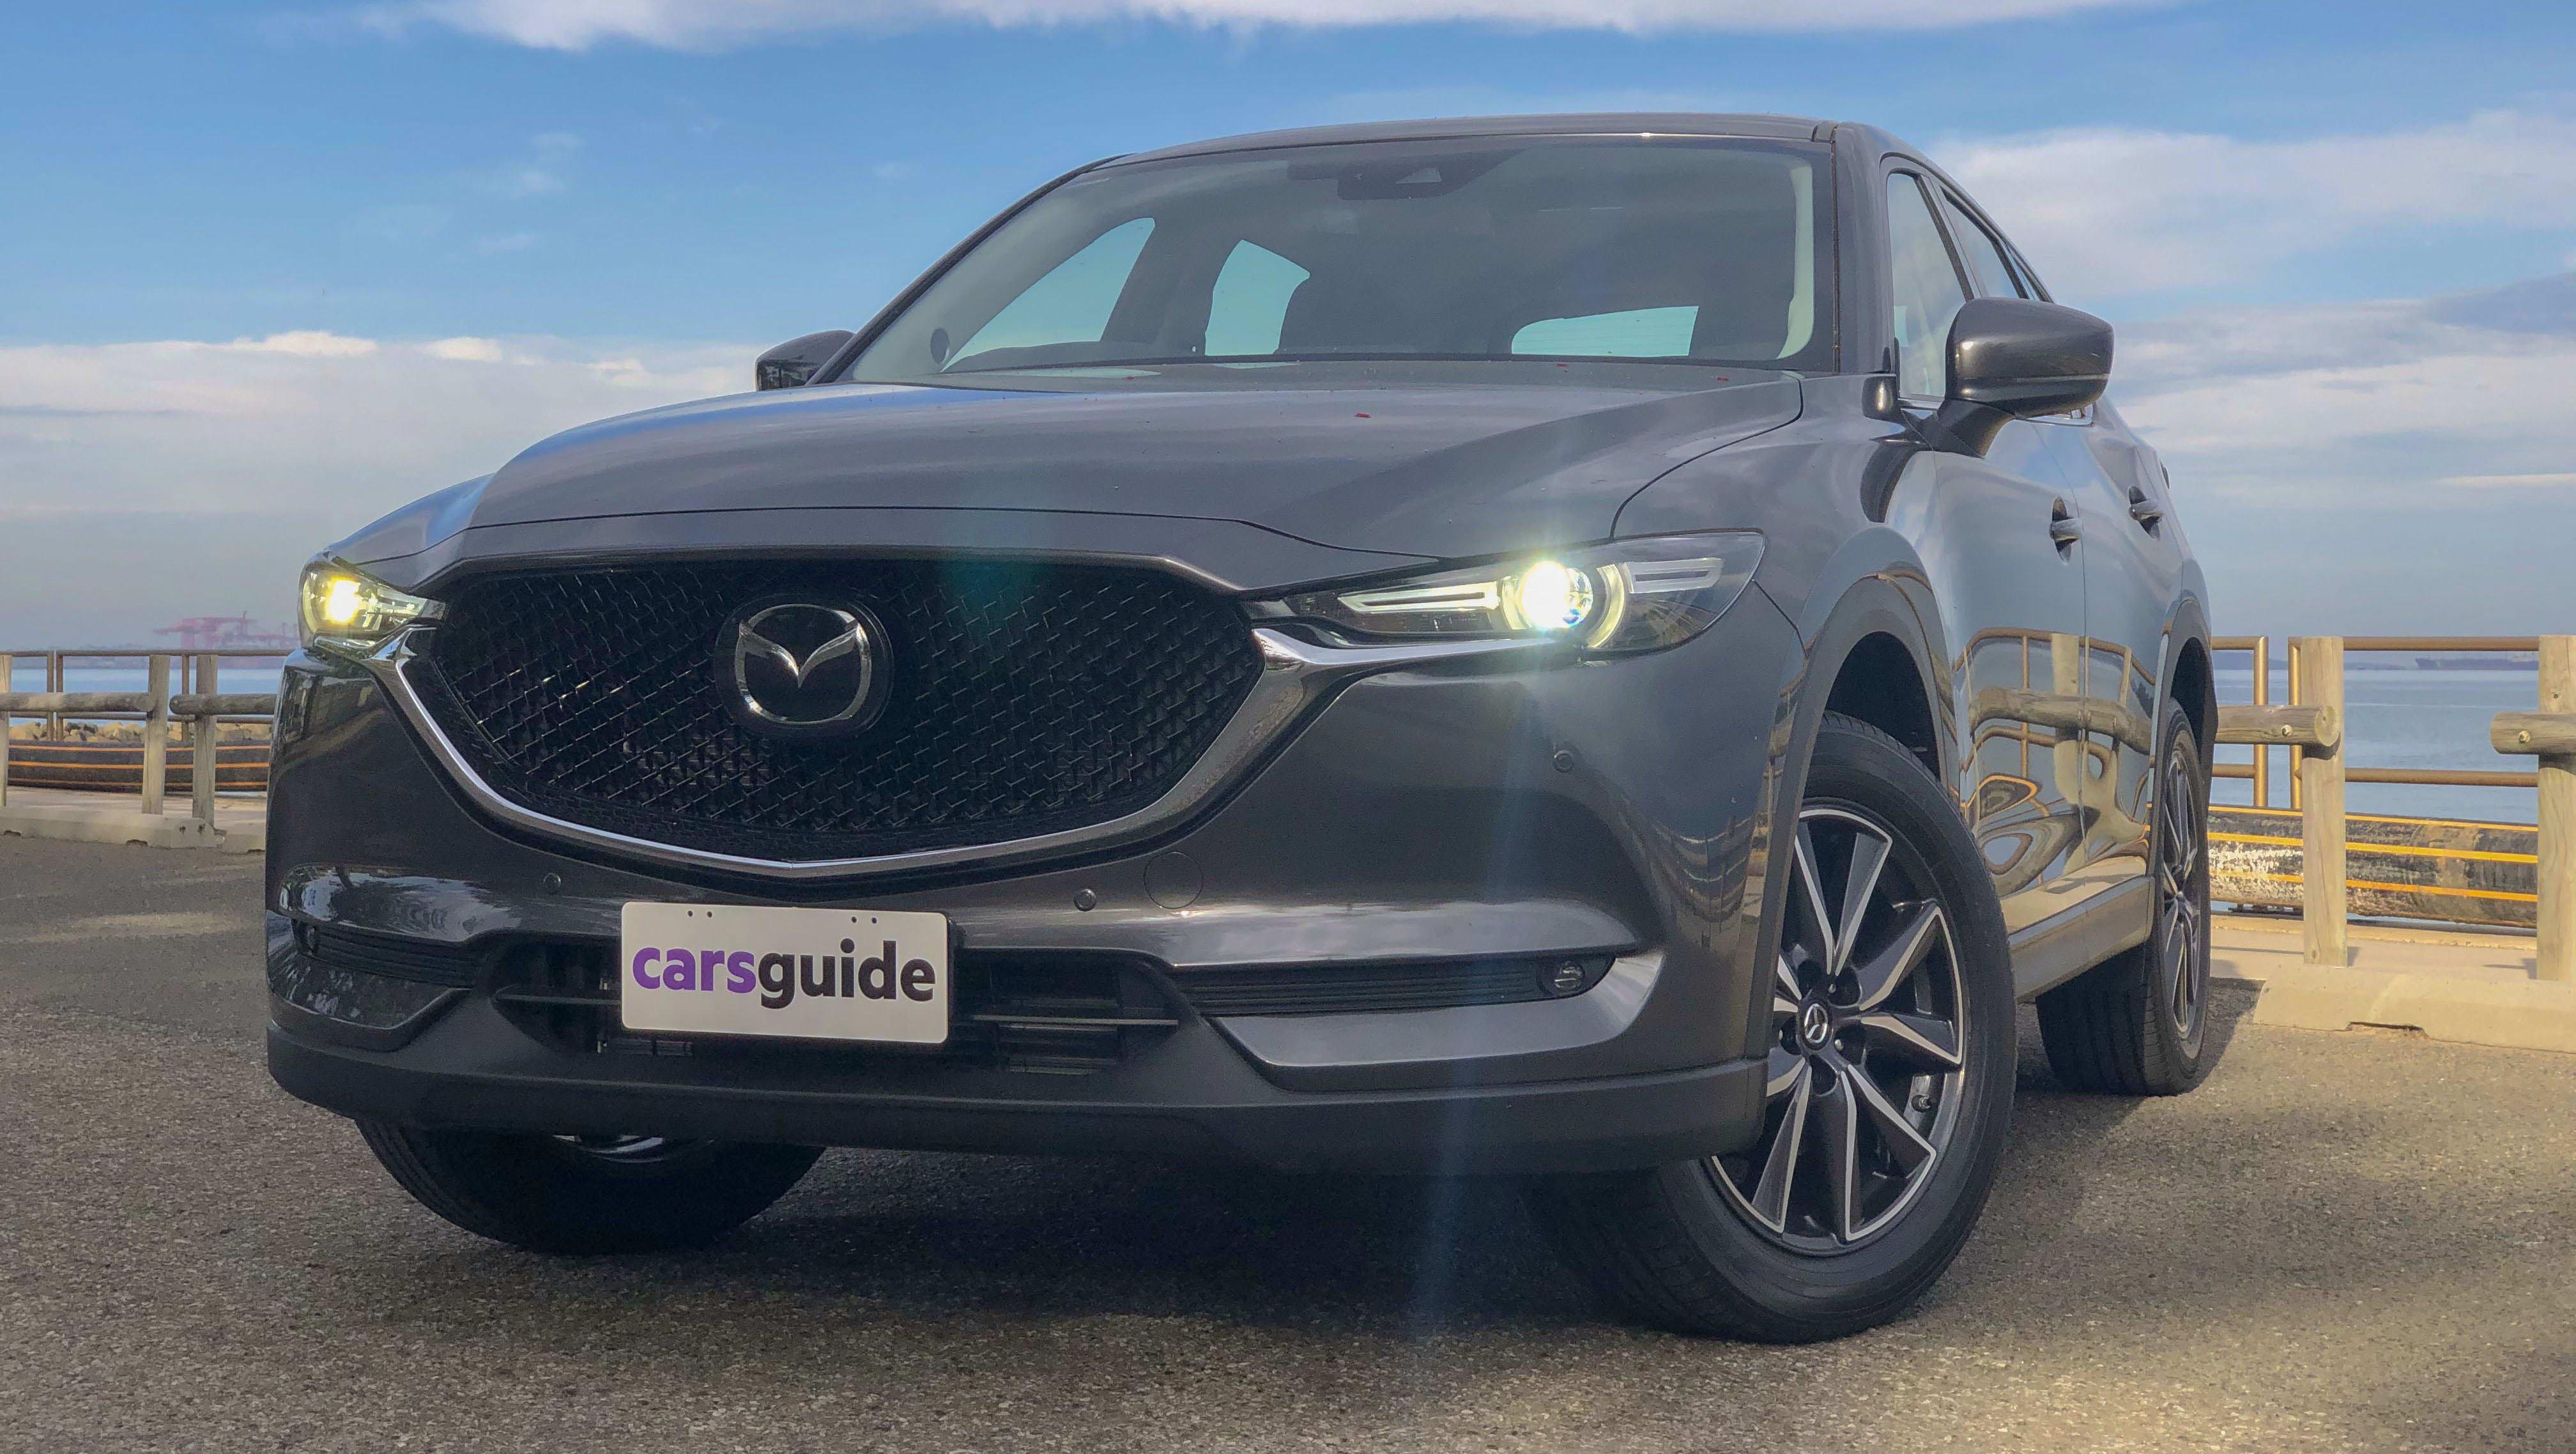 Kelebihan Kekurangan Mazda Cx 5 4X4 Murah Berkualitas